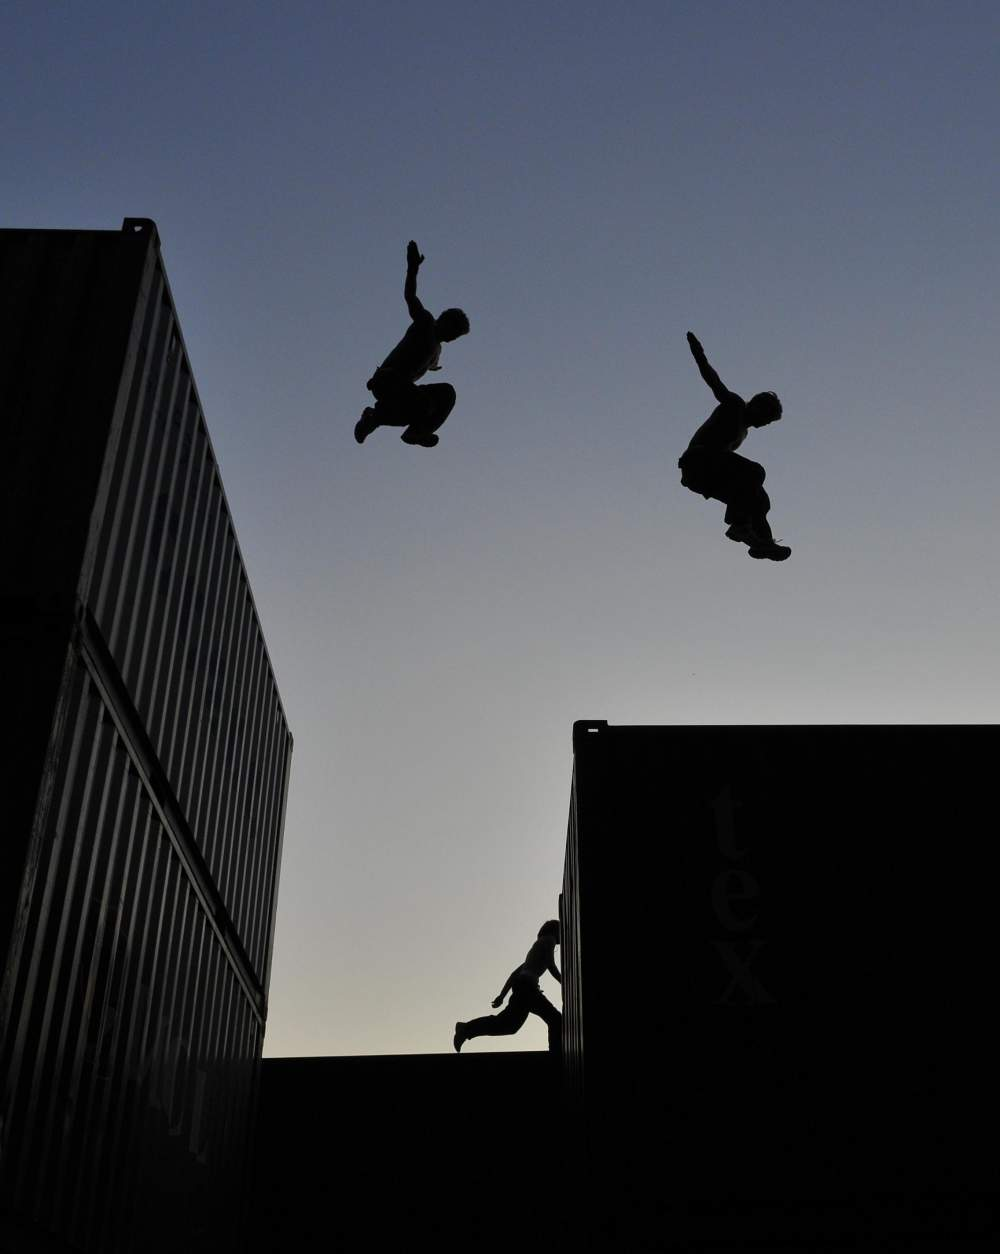 Parkour, Stunts and Gap on Pinterest